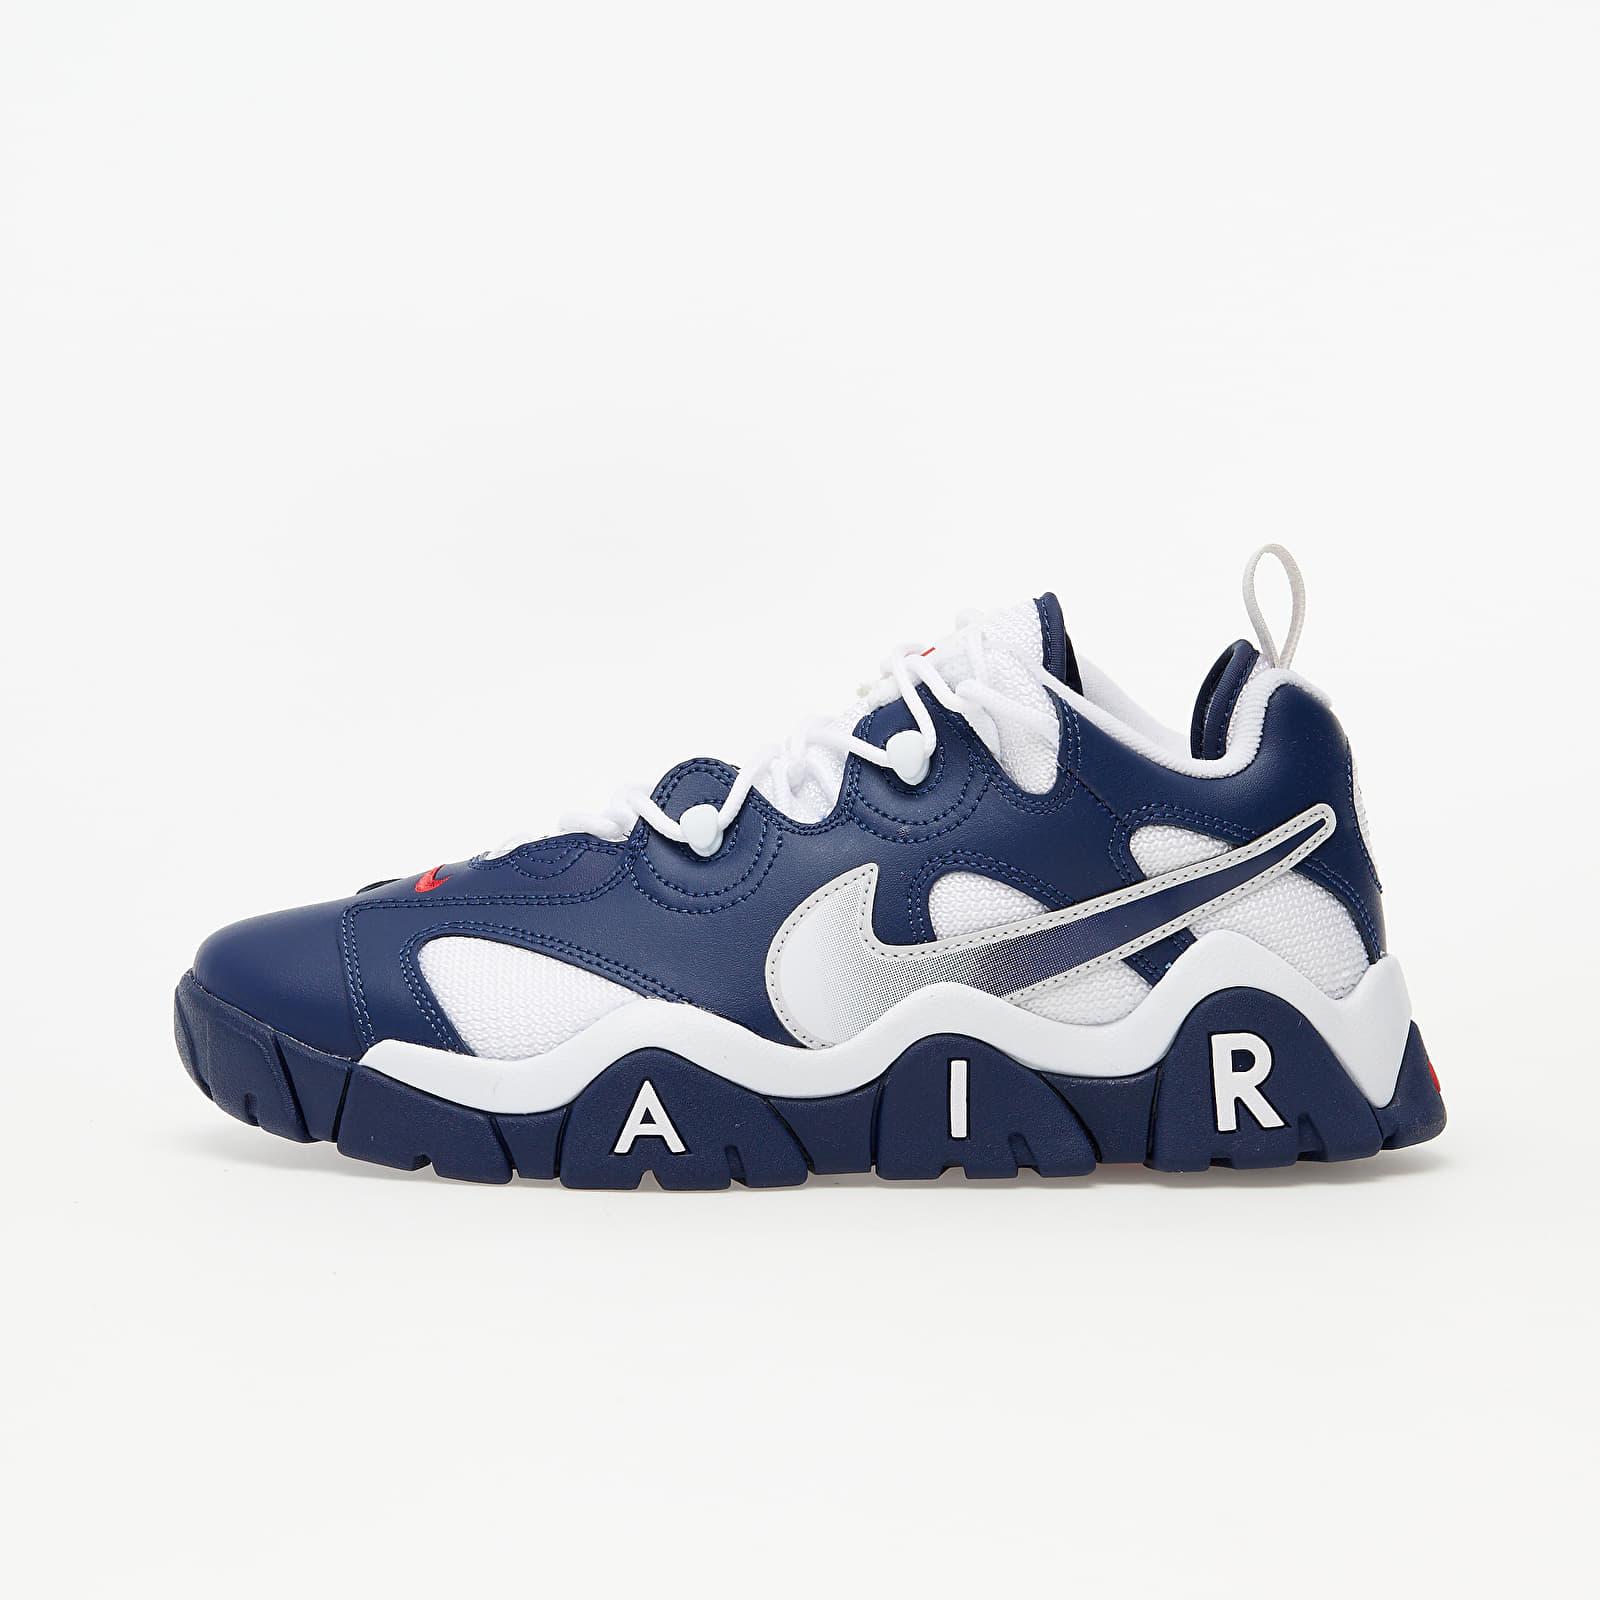 Nike Air Barrage Low Midnight Navy/ Midnight Navy-White, Blue